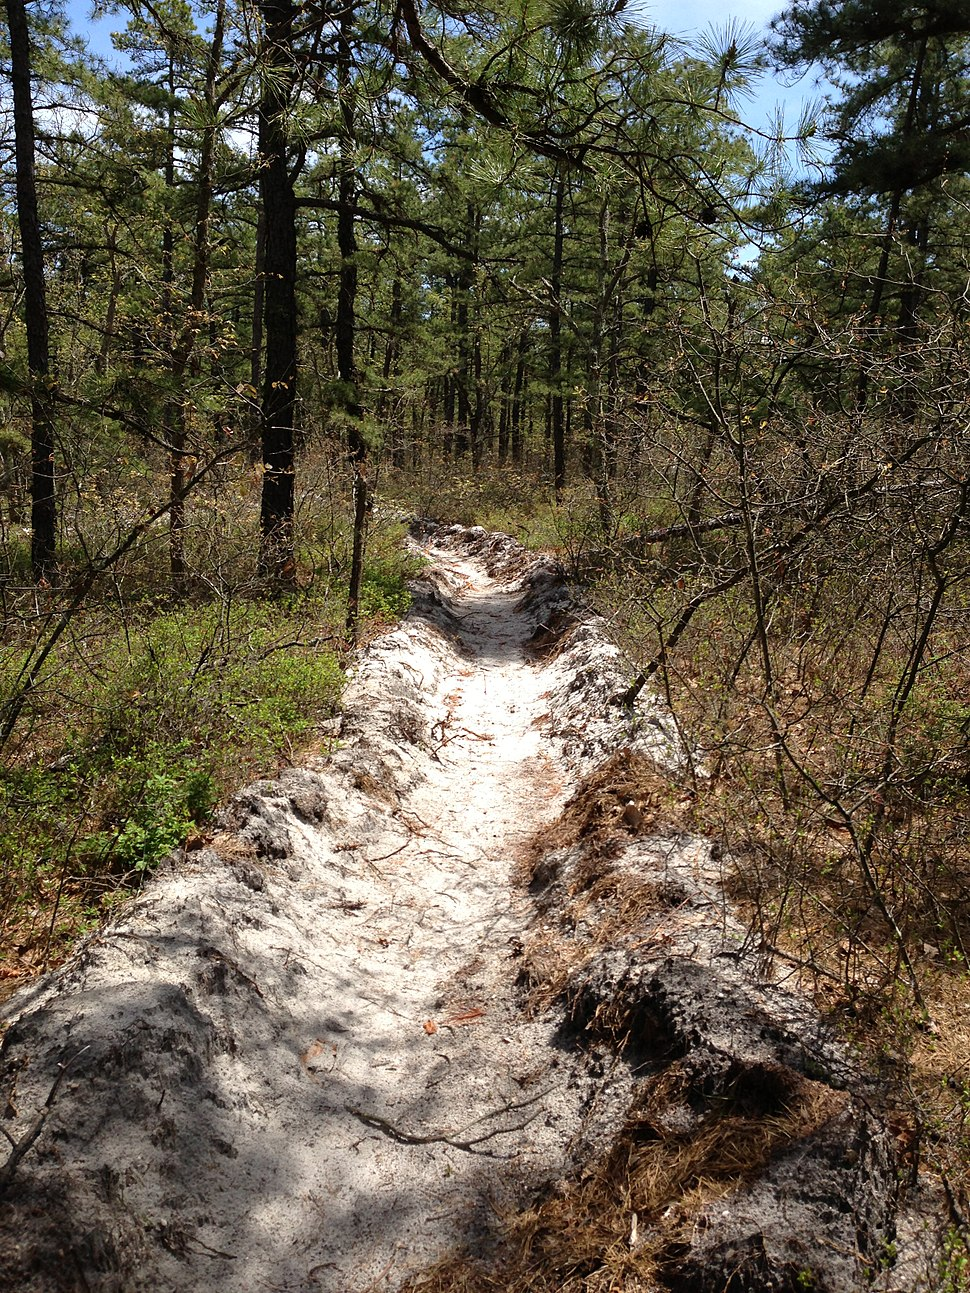 2013-05-10 12 18 27 Freshly dug fire break along the Mount Misery Trail in Brendan T. Byrne State Forest